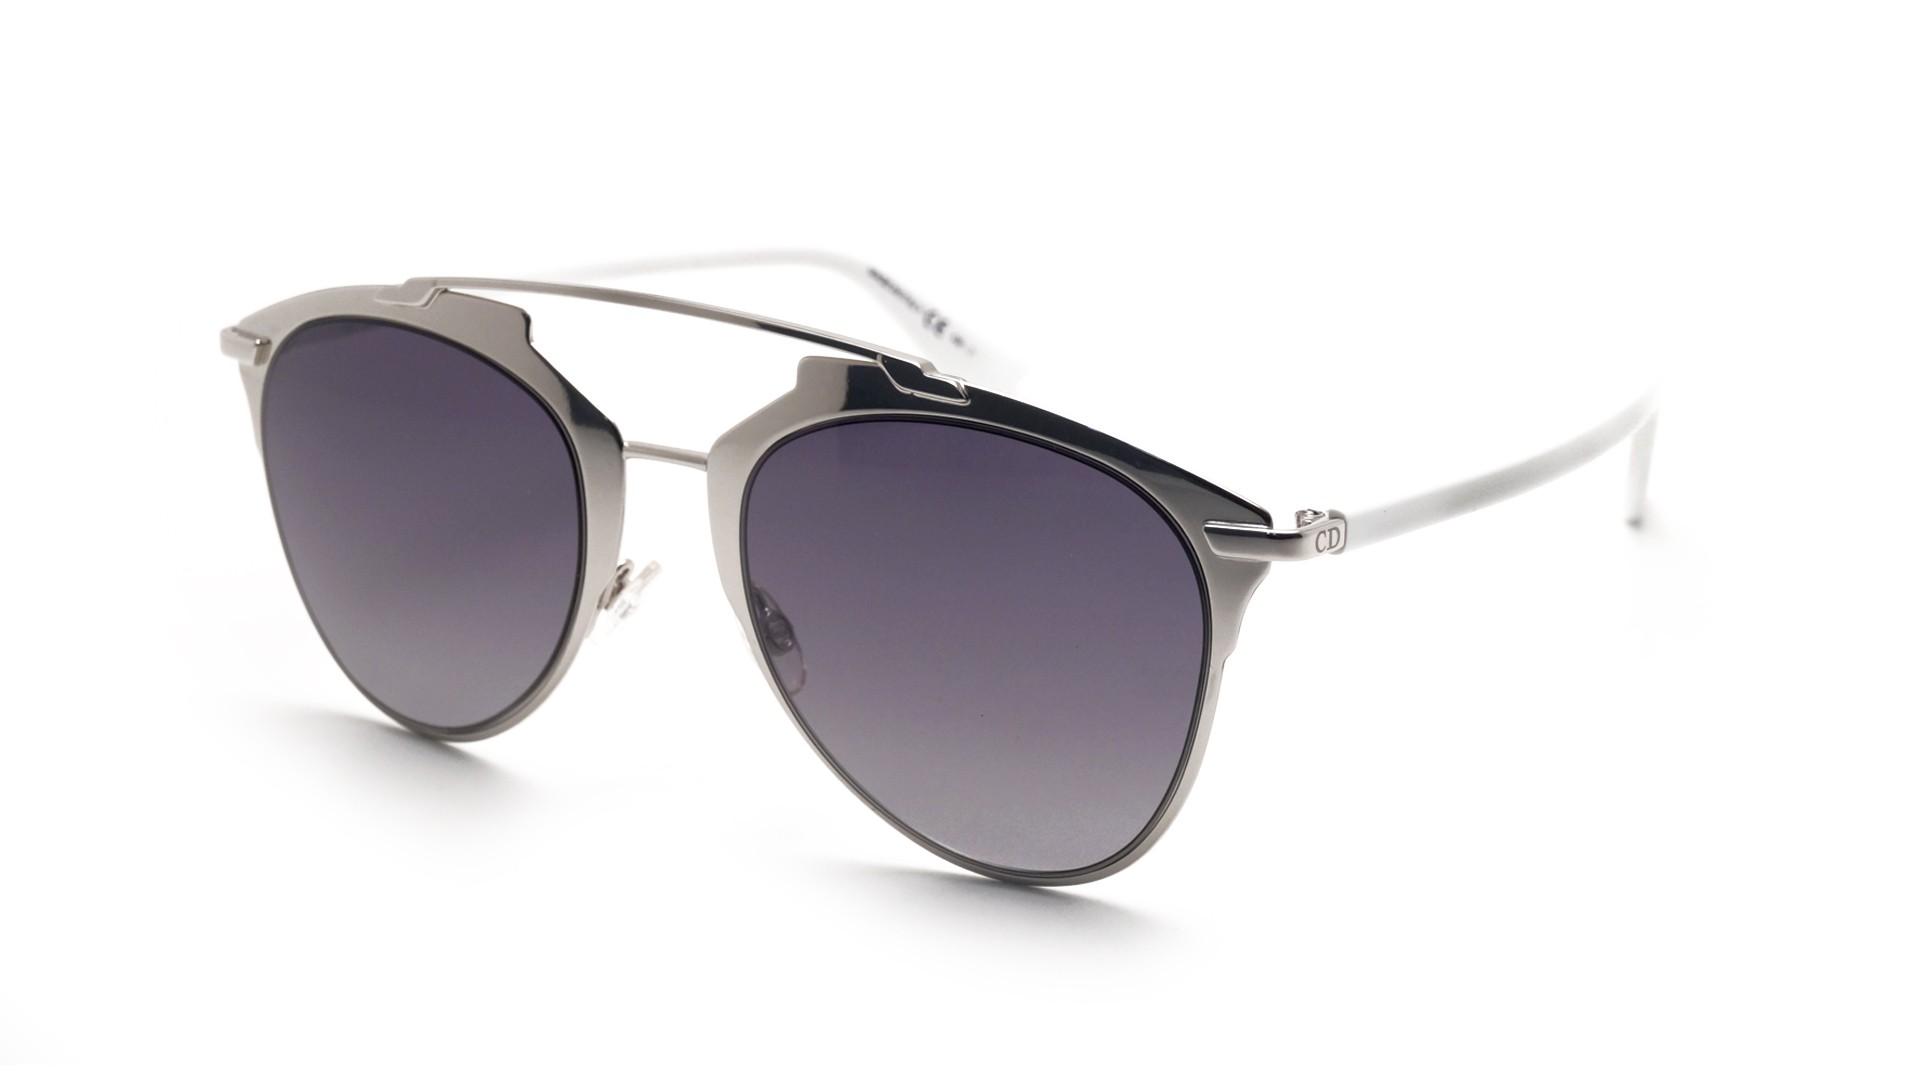 92f02cb9e208 Sunglasses Dior Reflected Silver REFLECTED 85LHD 52-21 Medium Gradient